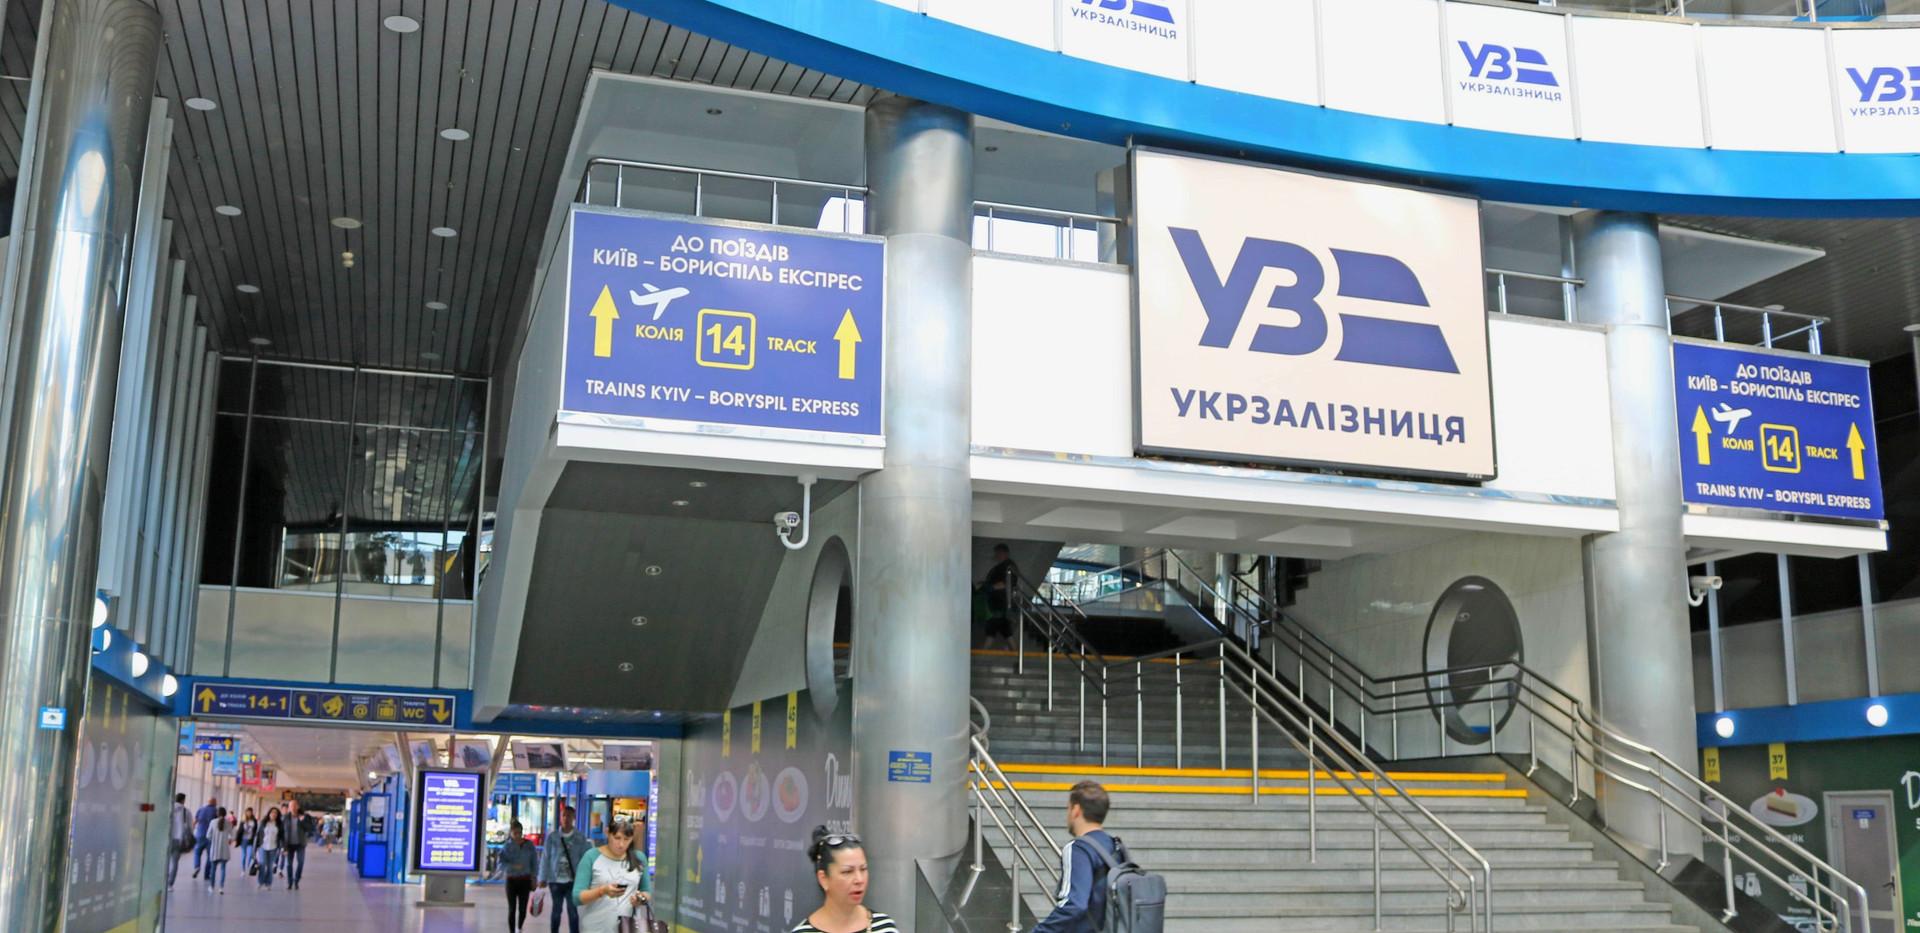 Pivdennyi station Kiev Ukraine